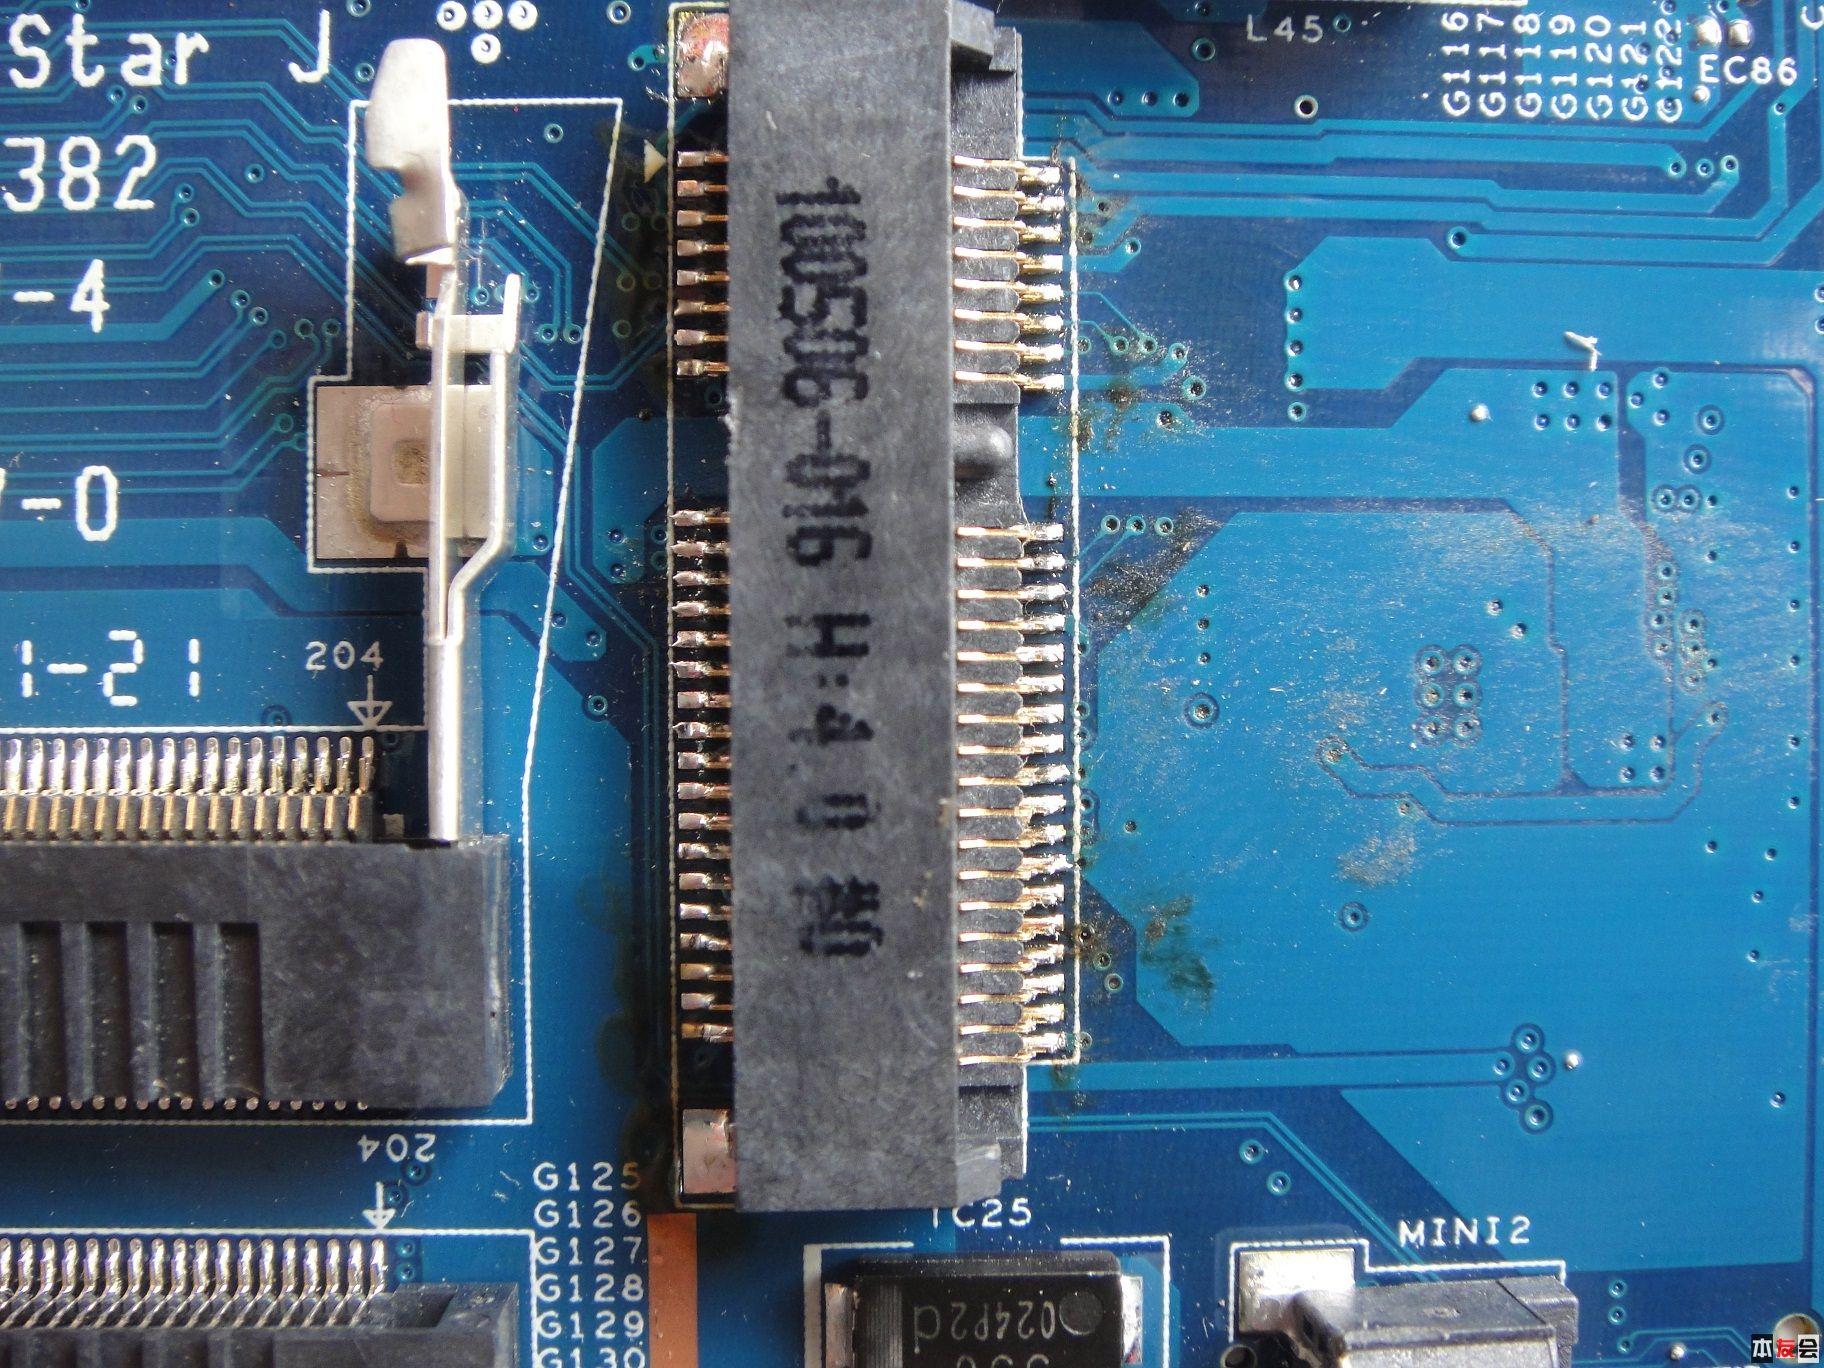 DSC05610.JPG